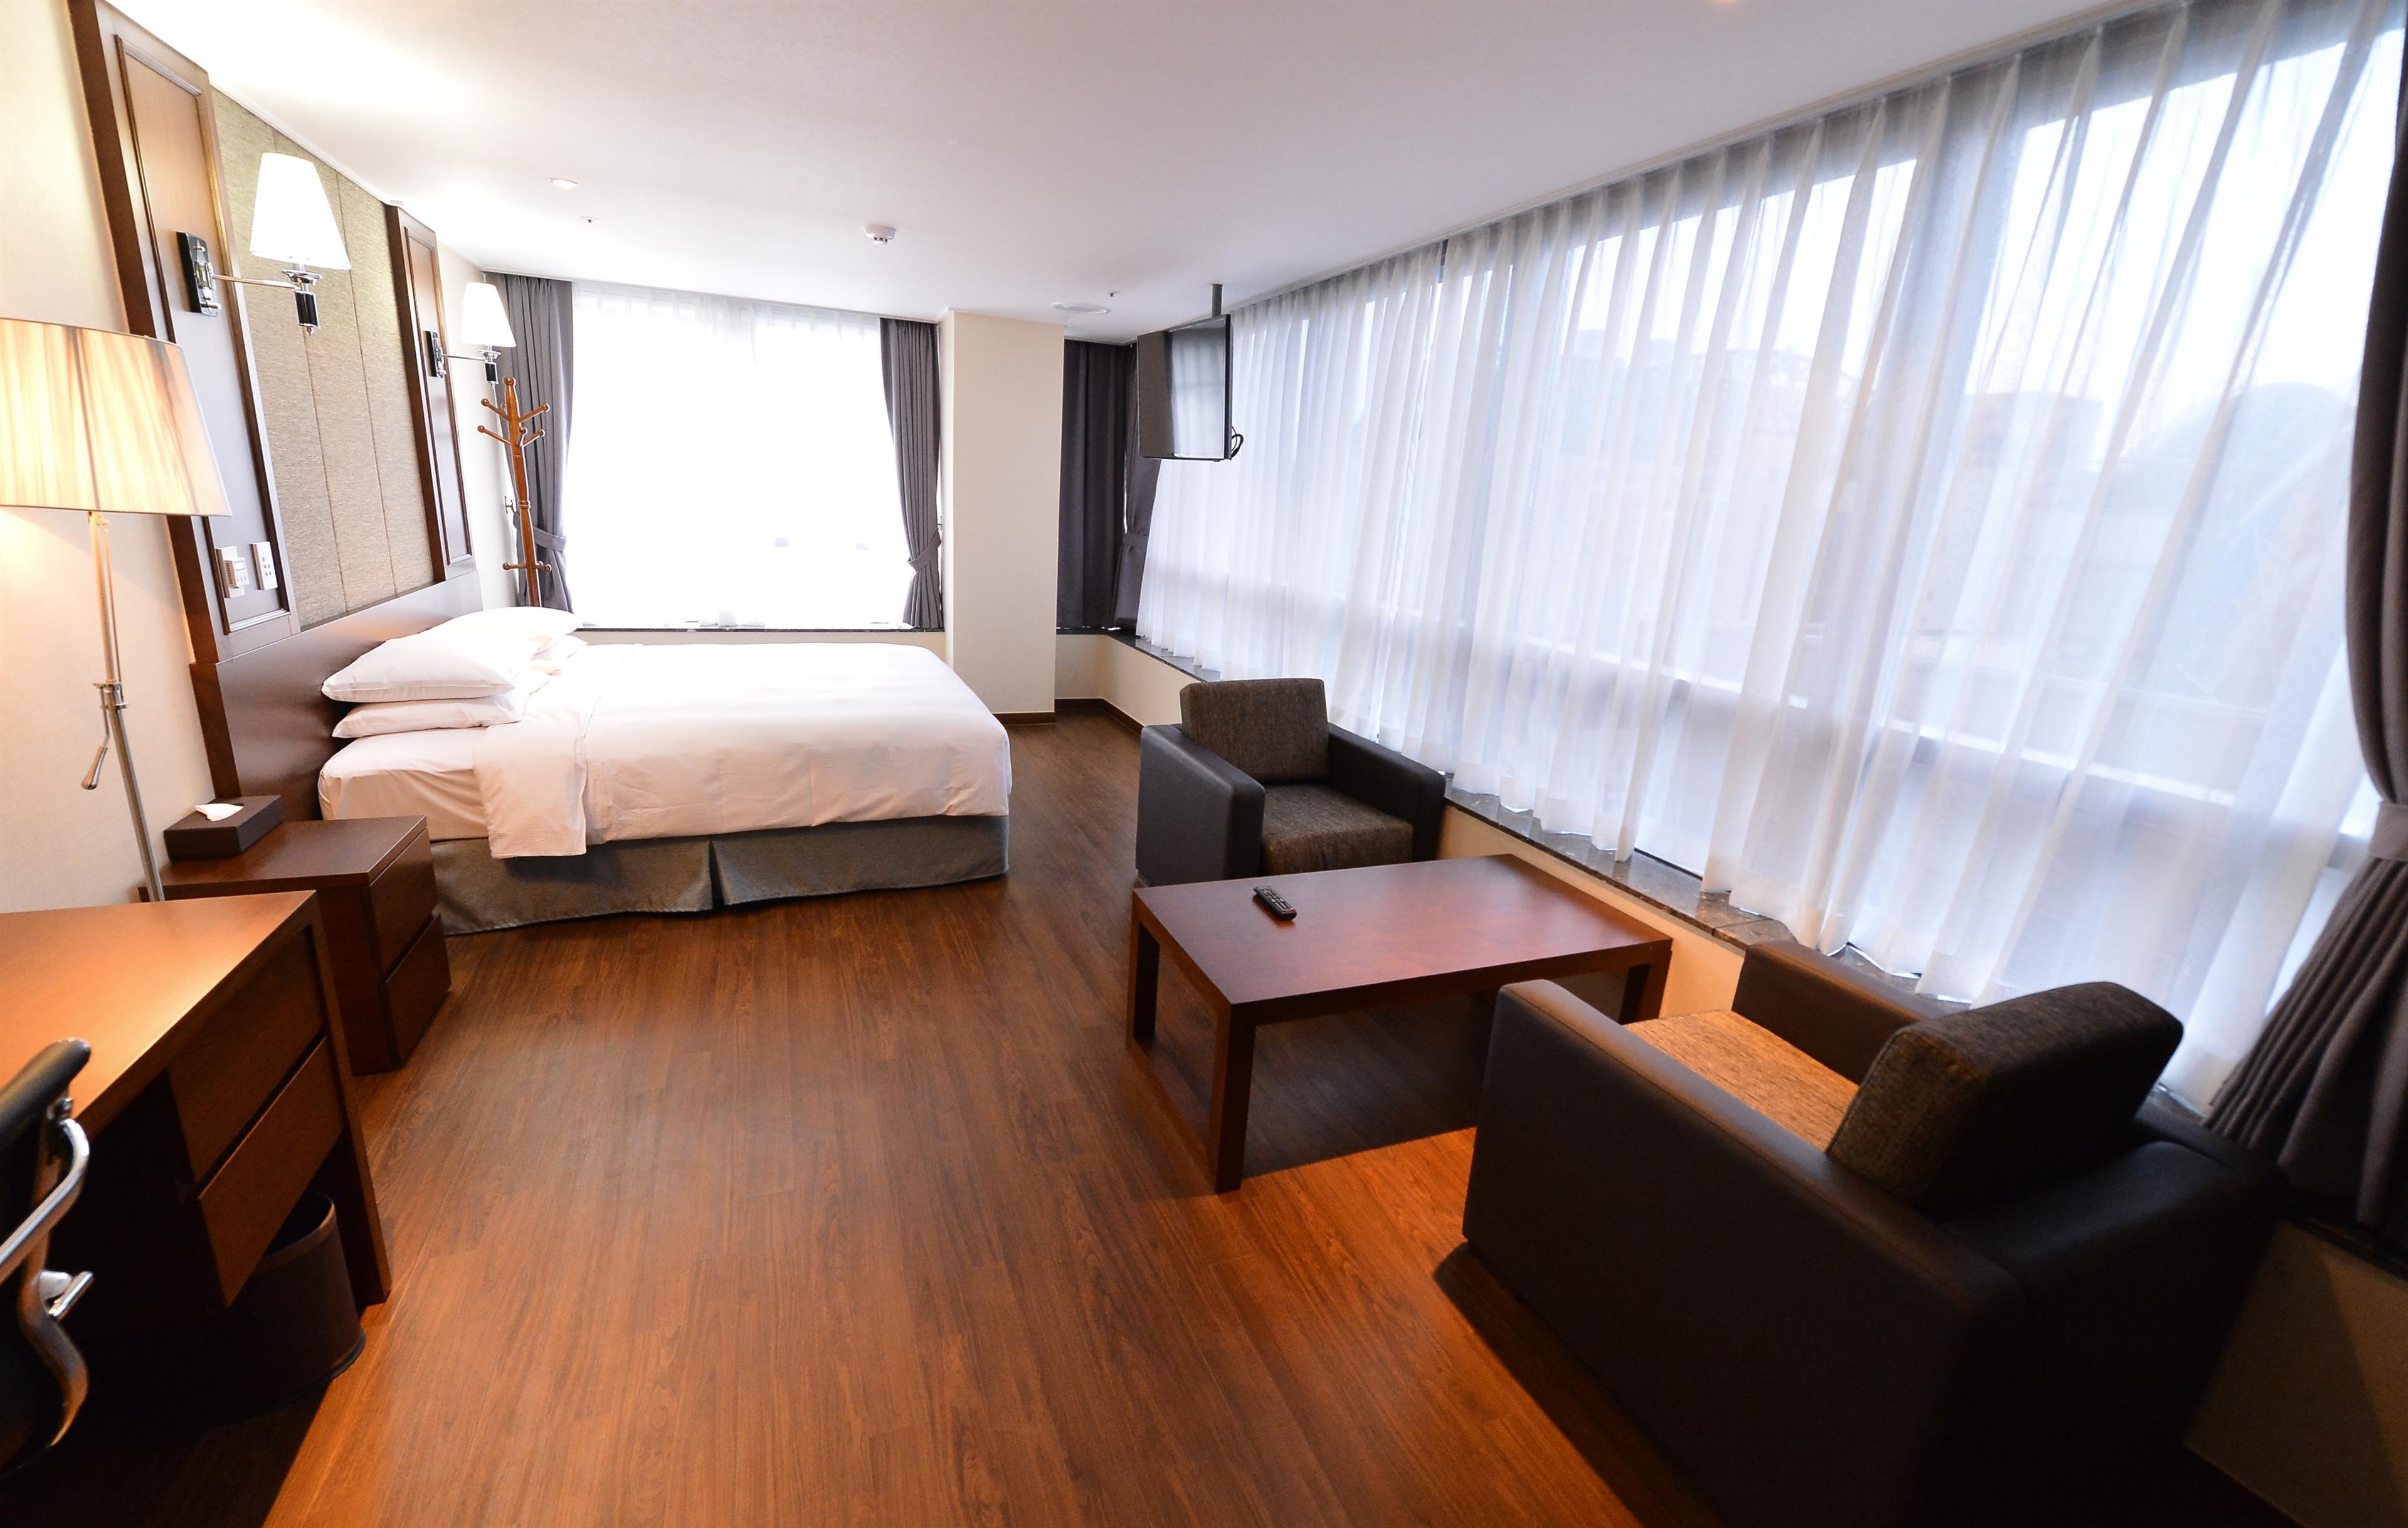 Value Hotel Worldwide High-End - Suwon South Korea